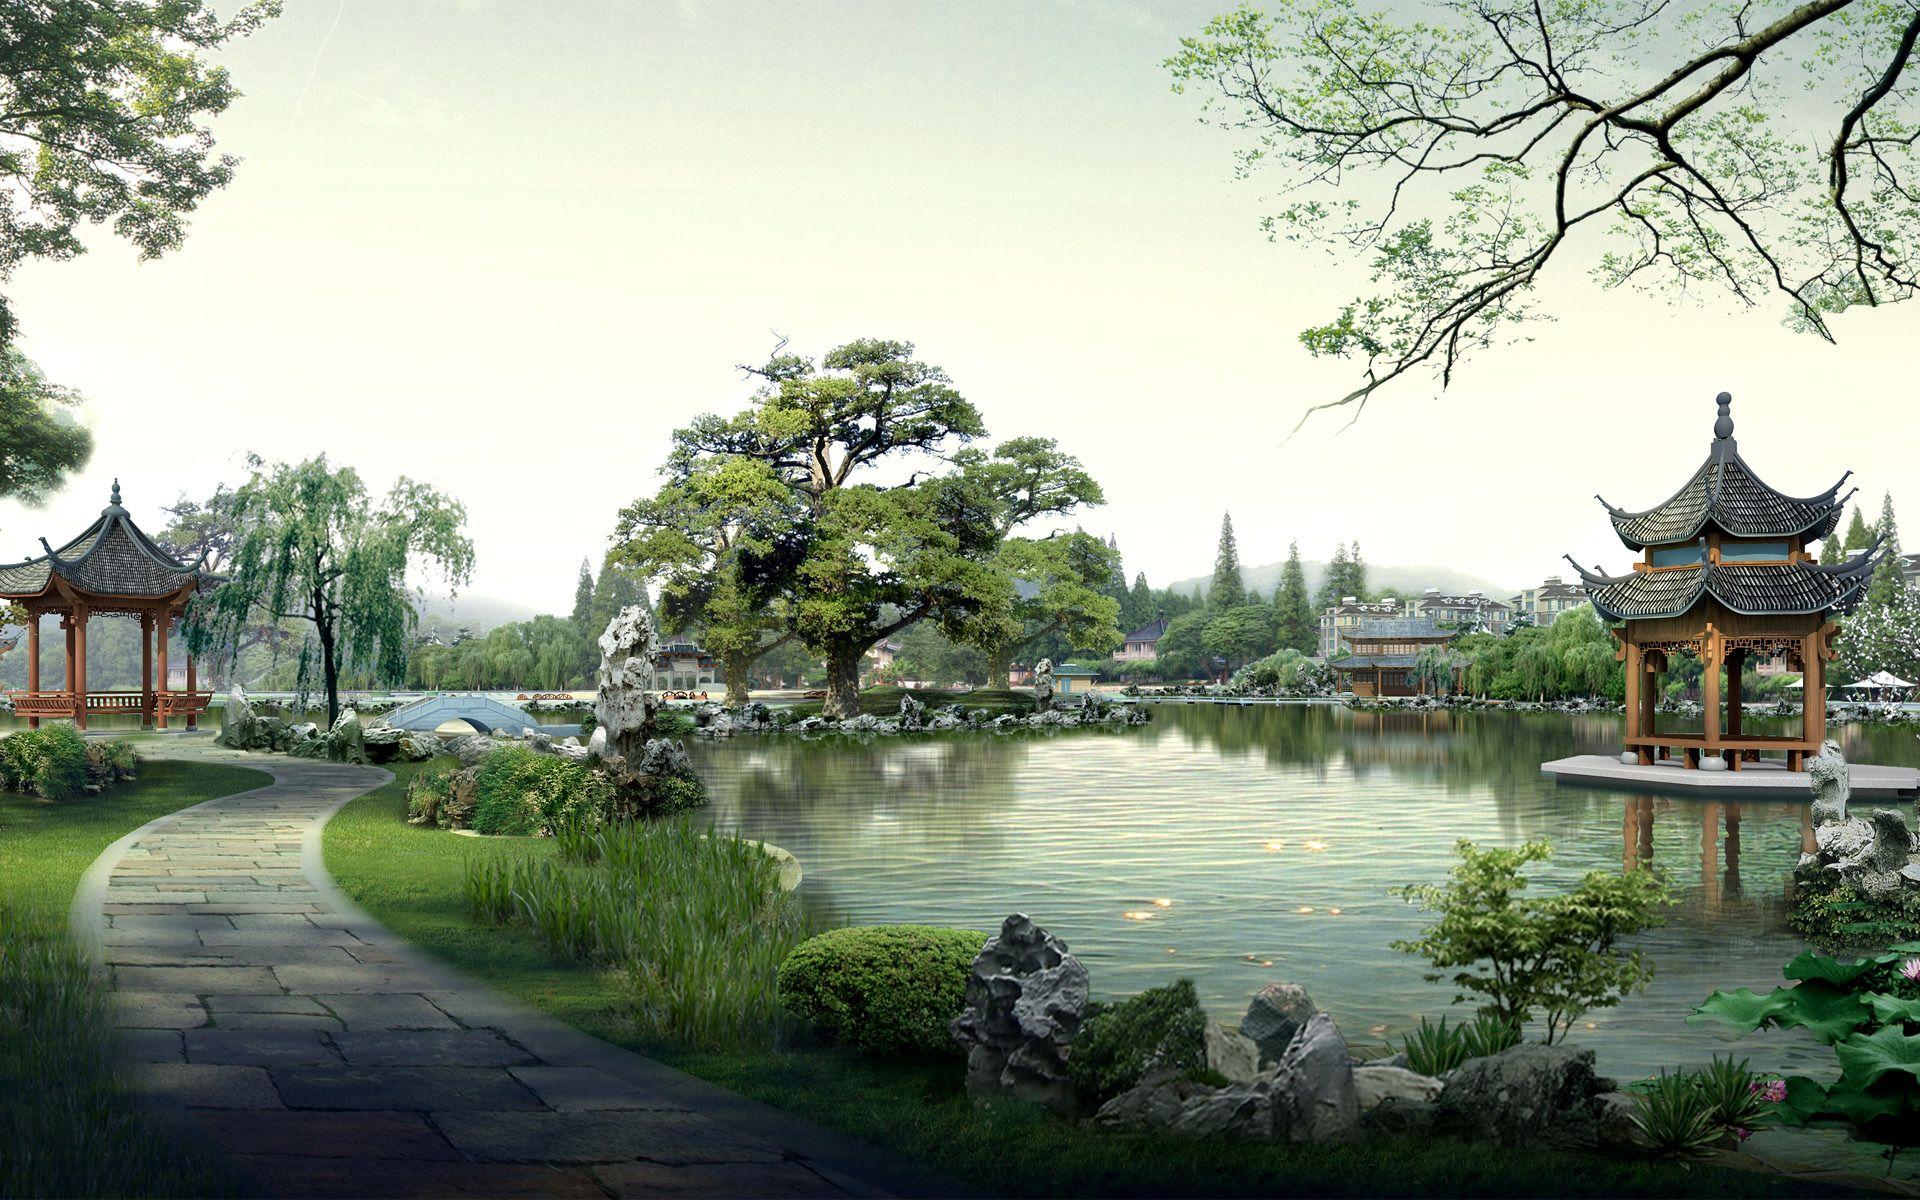 Landscape Nature Hd Garden Photography Inspiration Nature Chinese Landscape Nature Photography